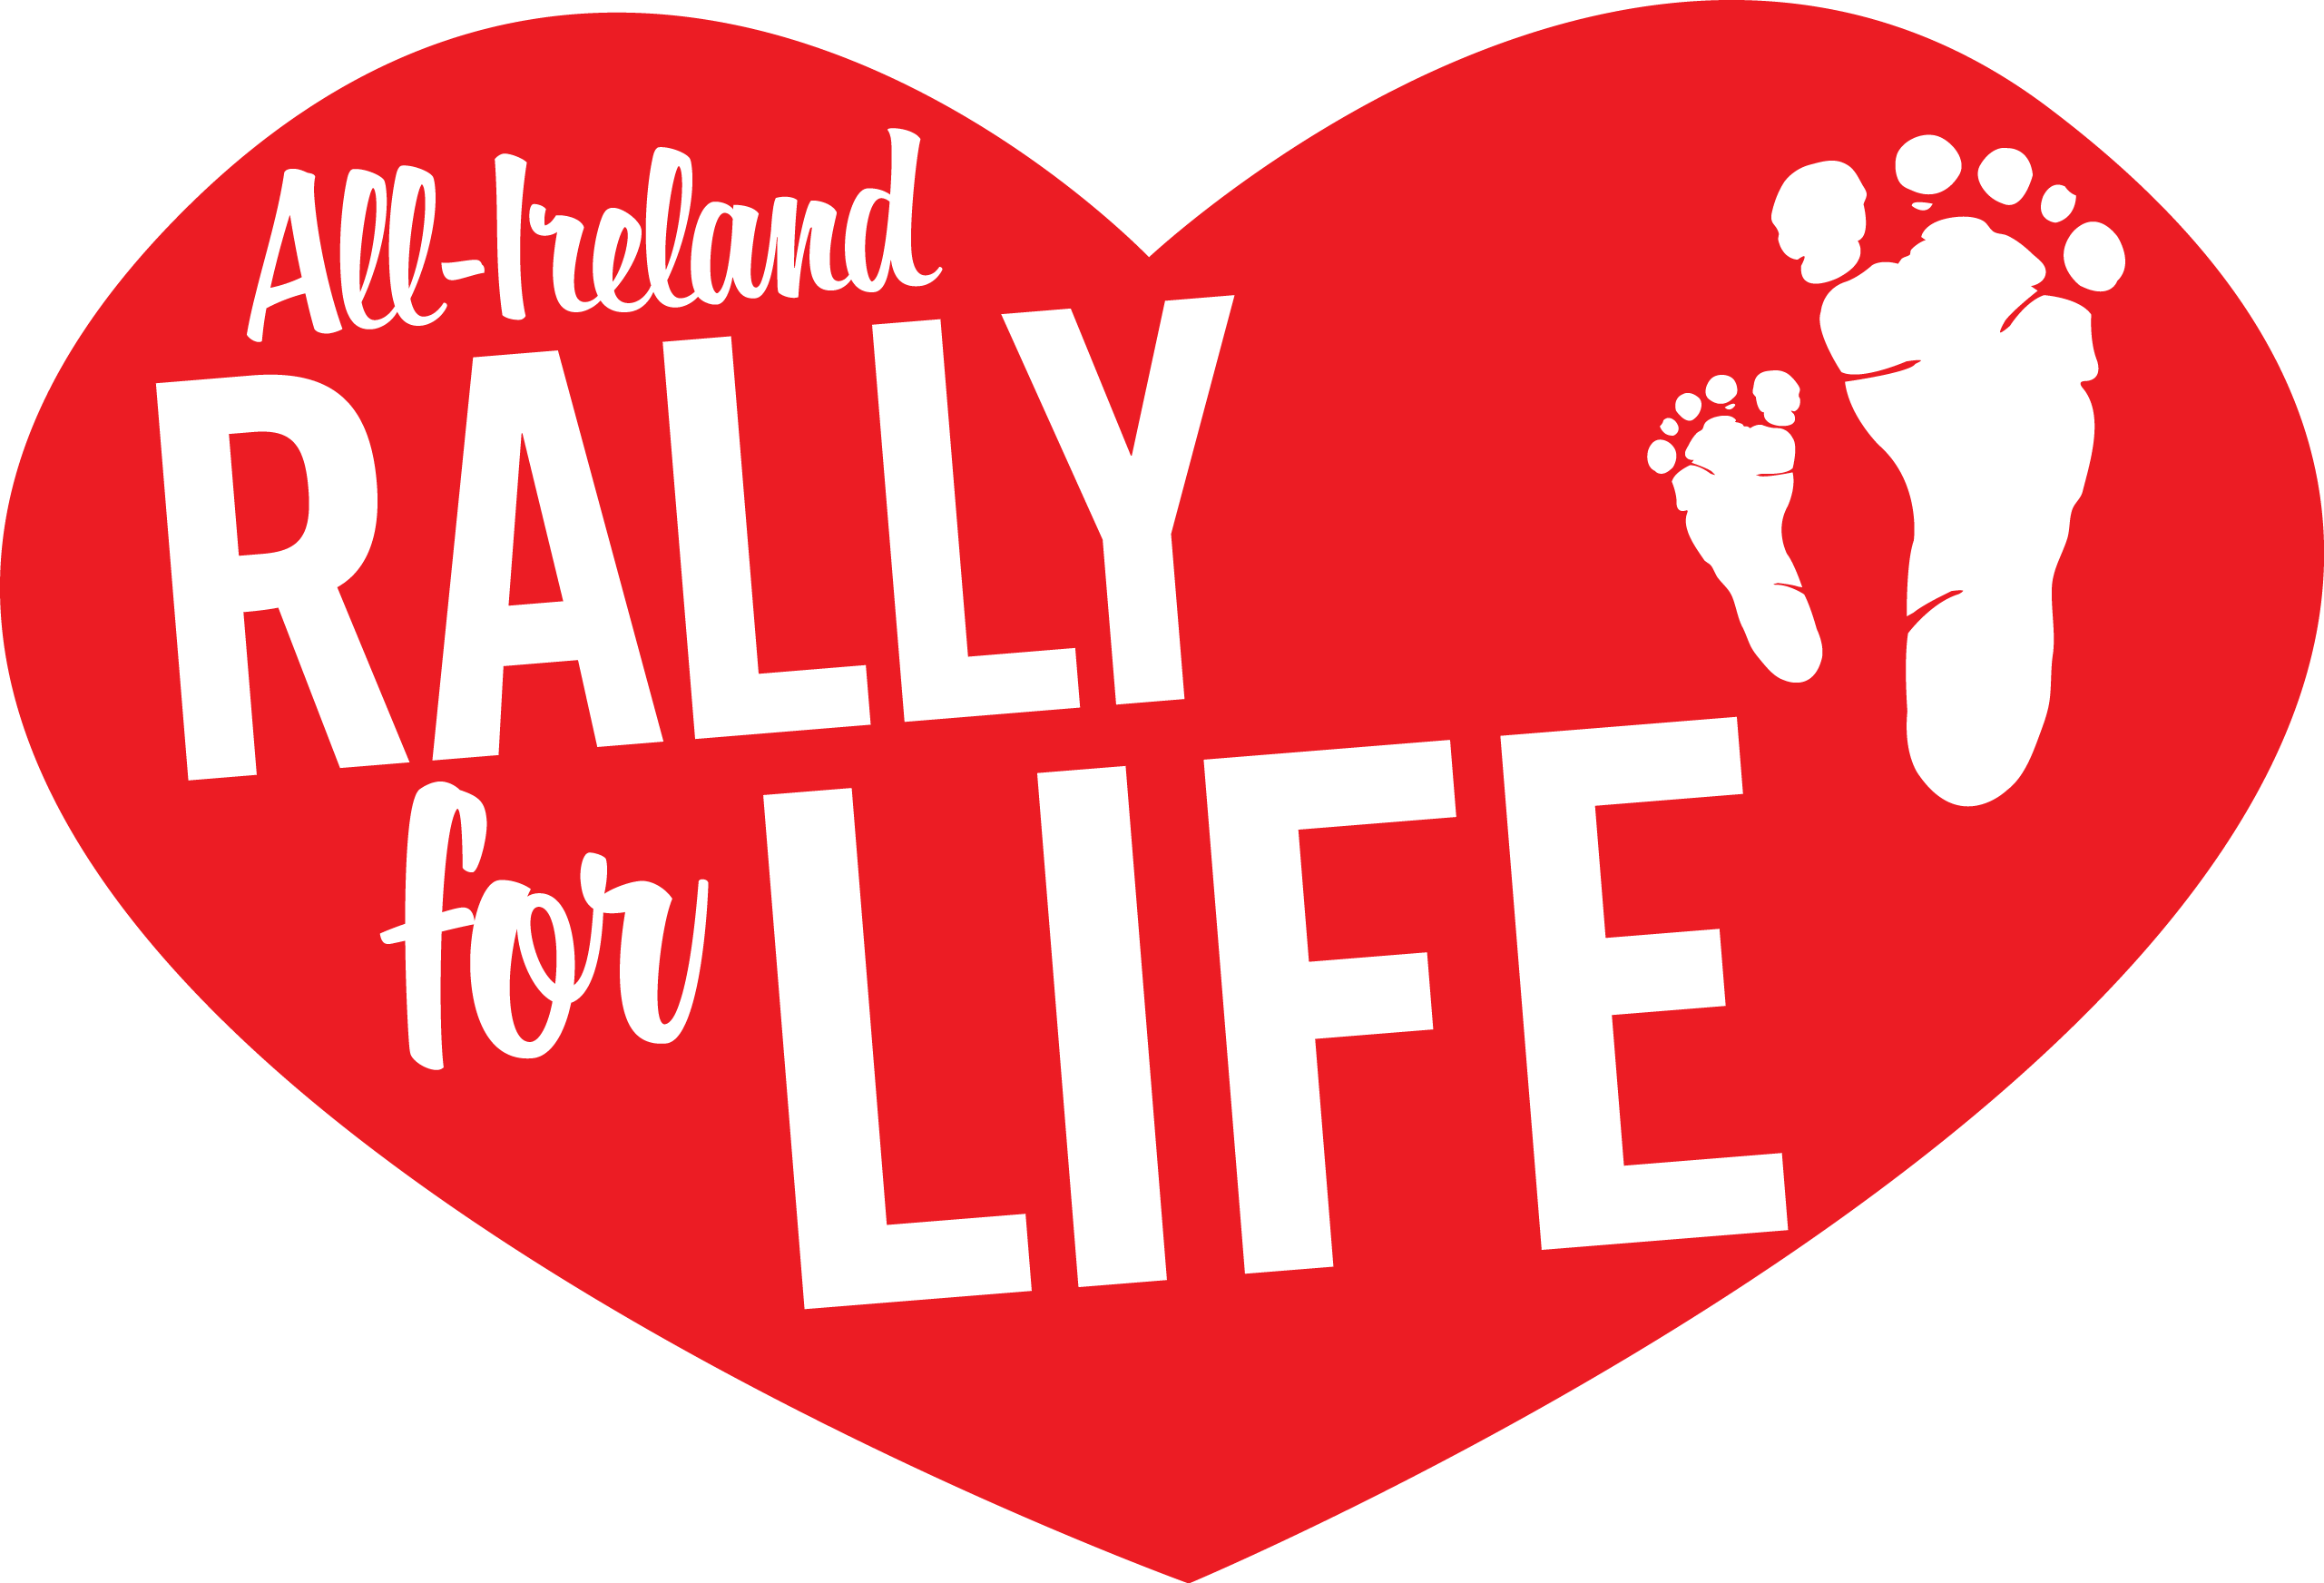 Rally_2013FInal_logo